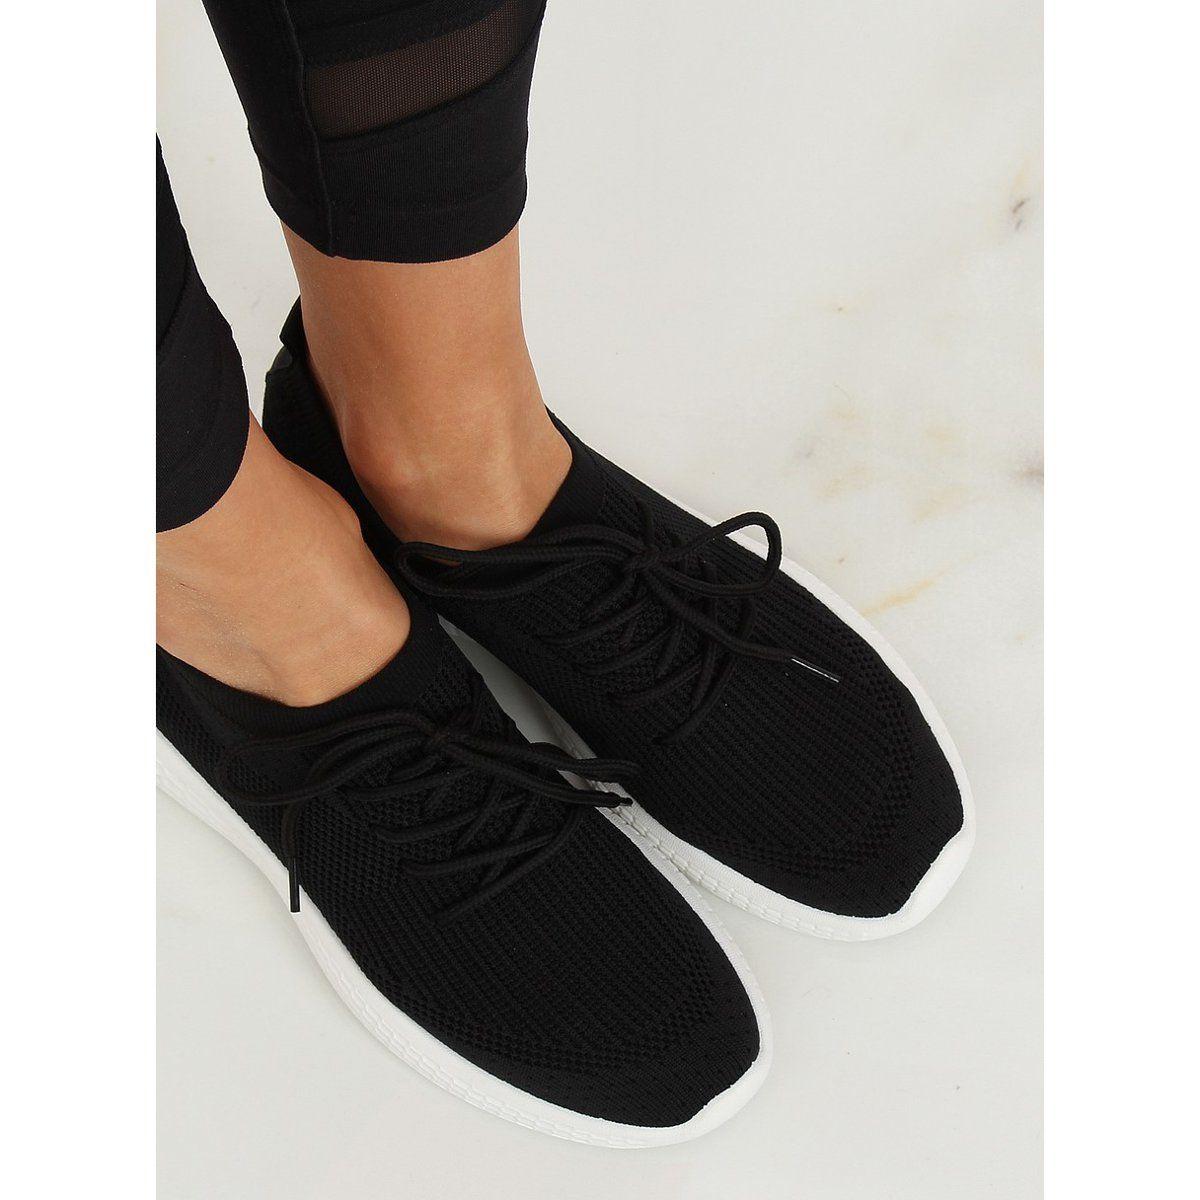 Buty Sportowe Czarne X 9755 Black Sport Shoes Black Sports Shoes Shoes